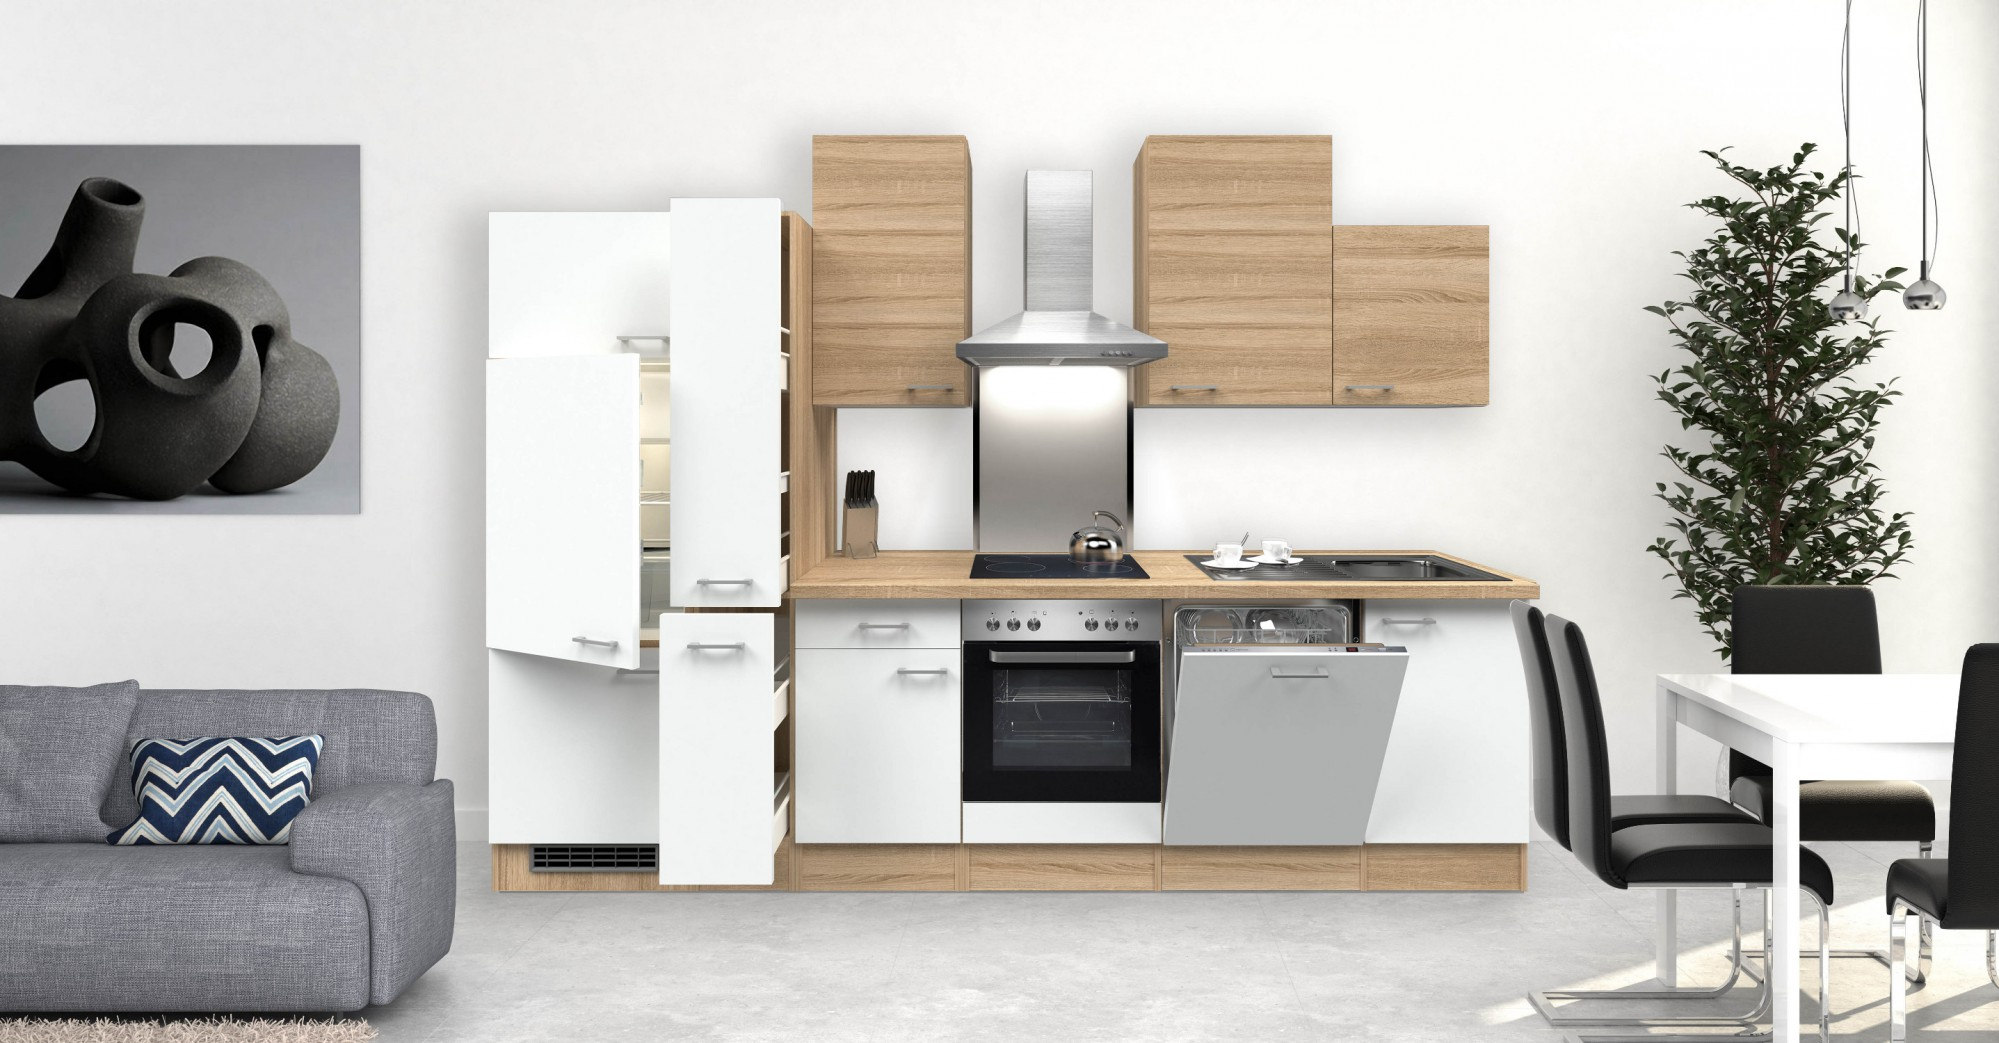 k chen sp lenschrank rom 2 t rig 100 cm breit wei. Black Bedroom Furniture Sets. Home Design Ideas